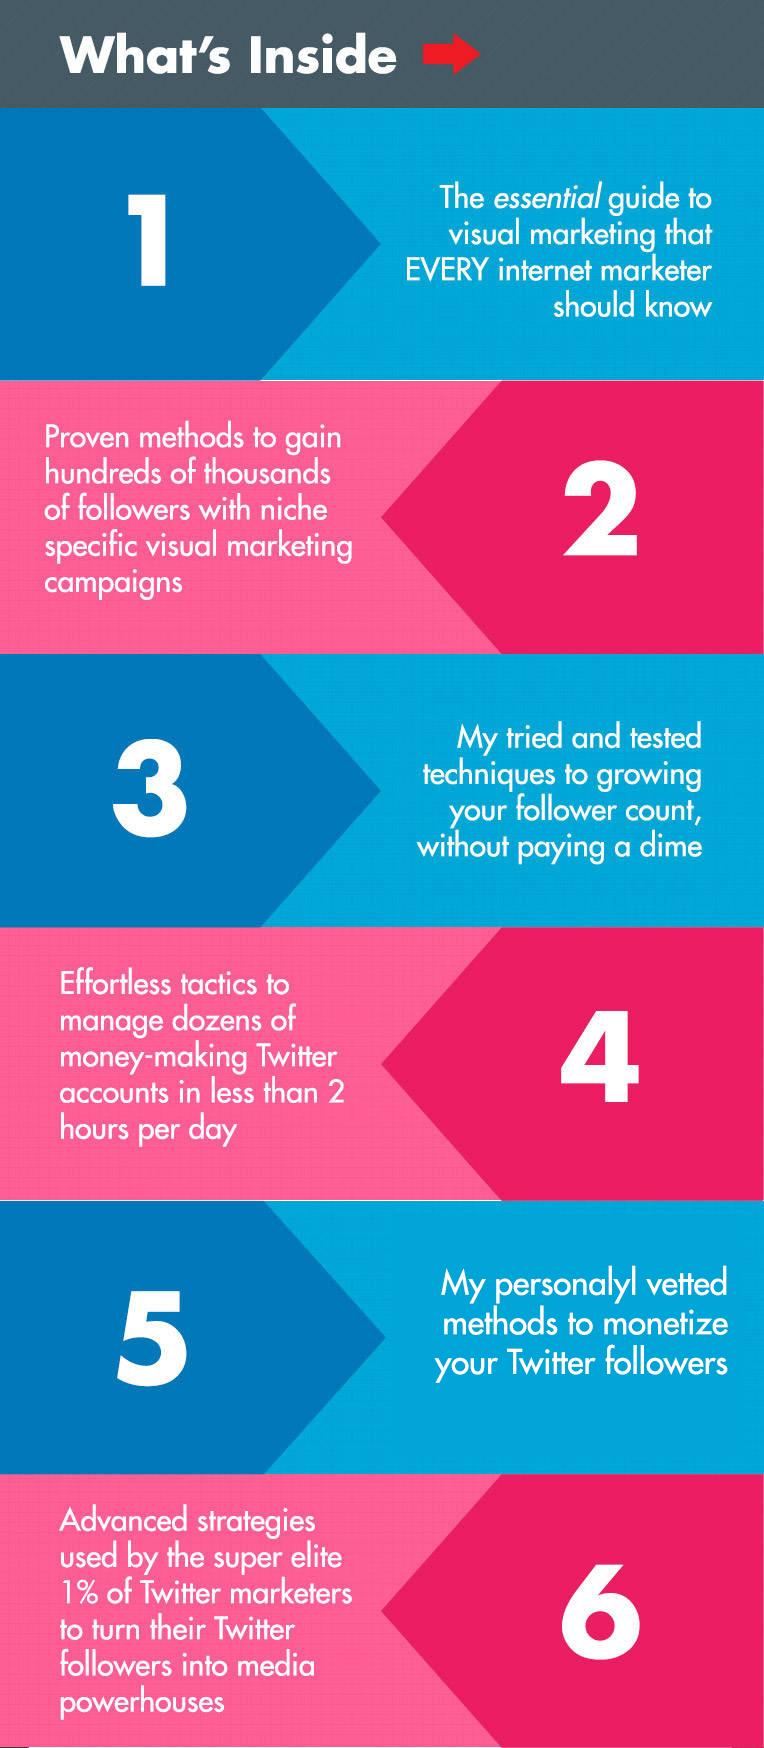 Twitter视觉营销 - 疯狂的简单策略将Twitter变成免费的流量引擎(Visual Marketing on Twitter)